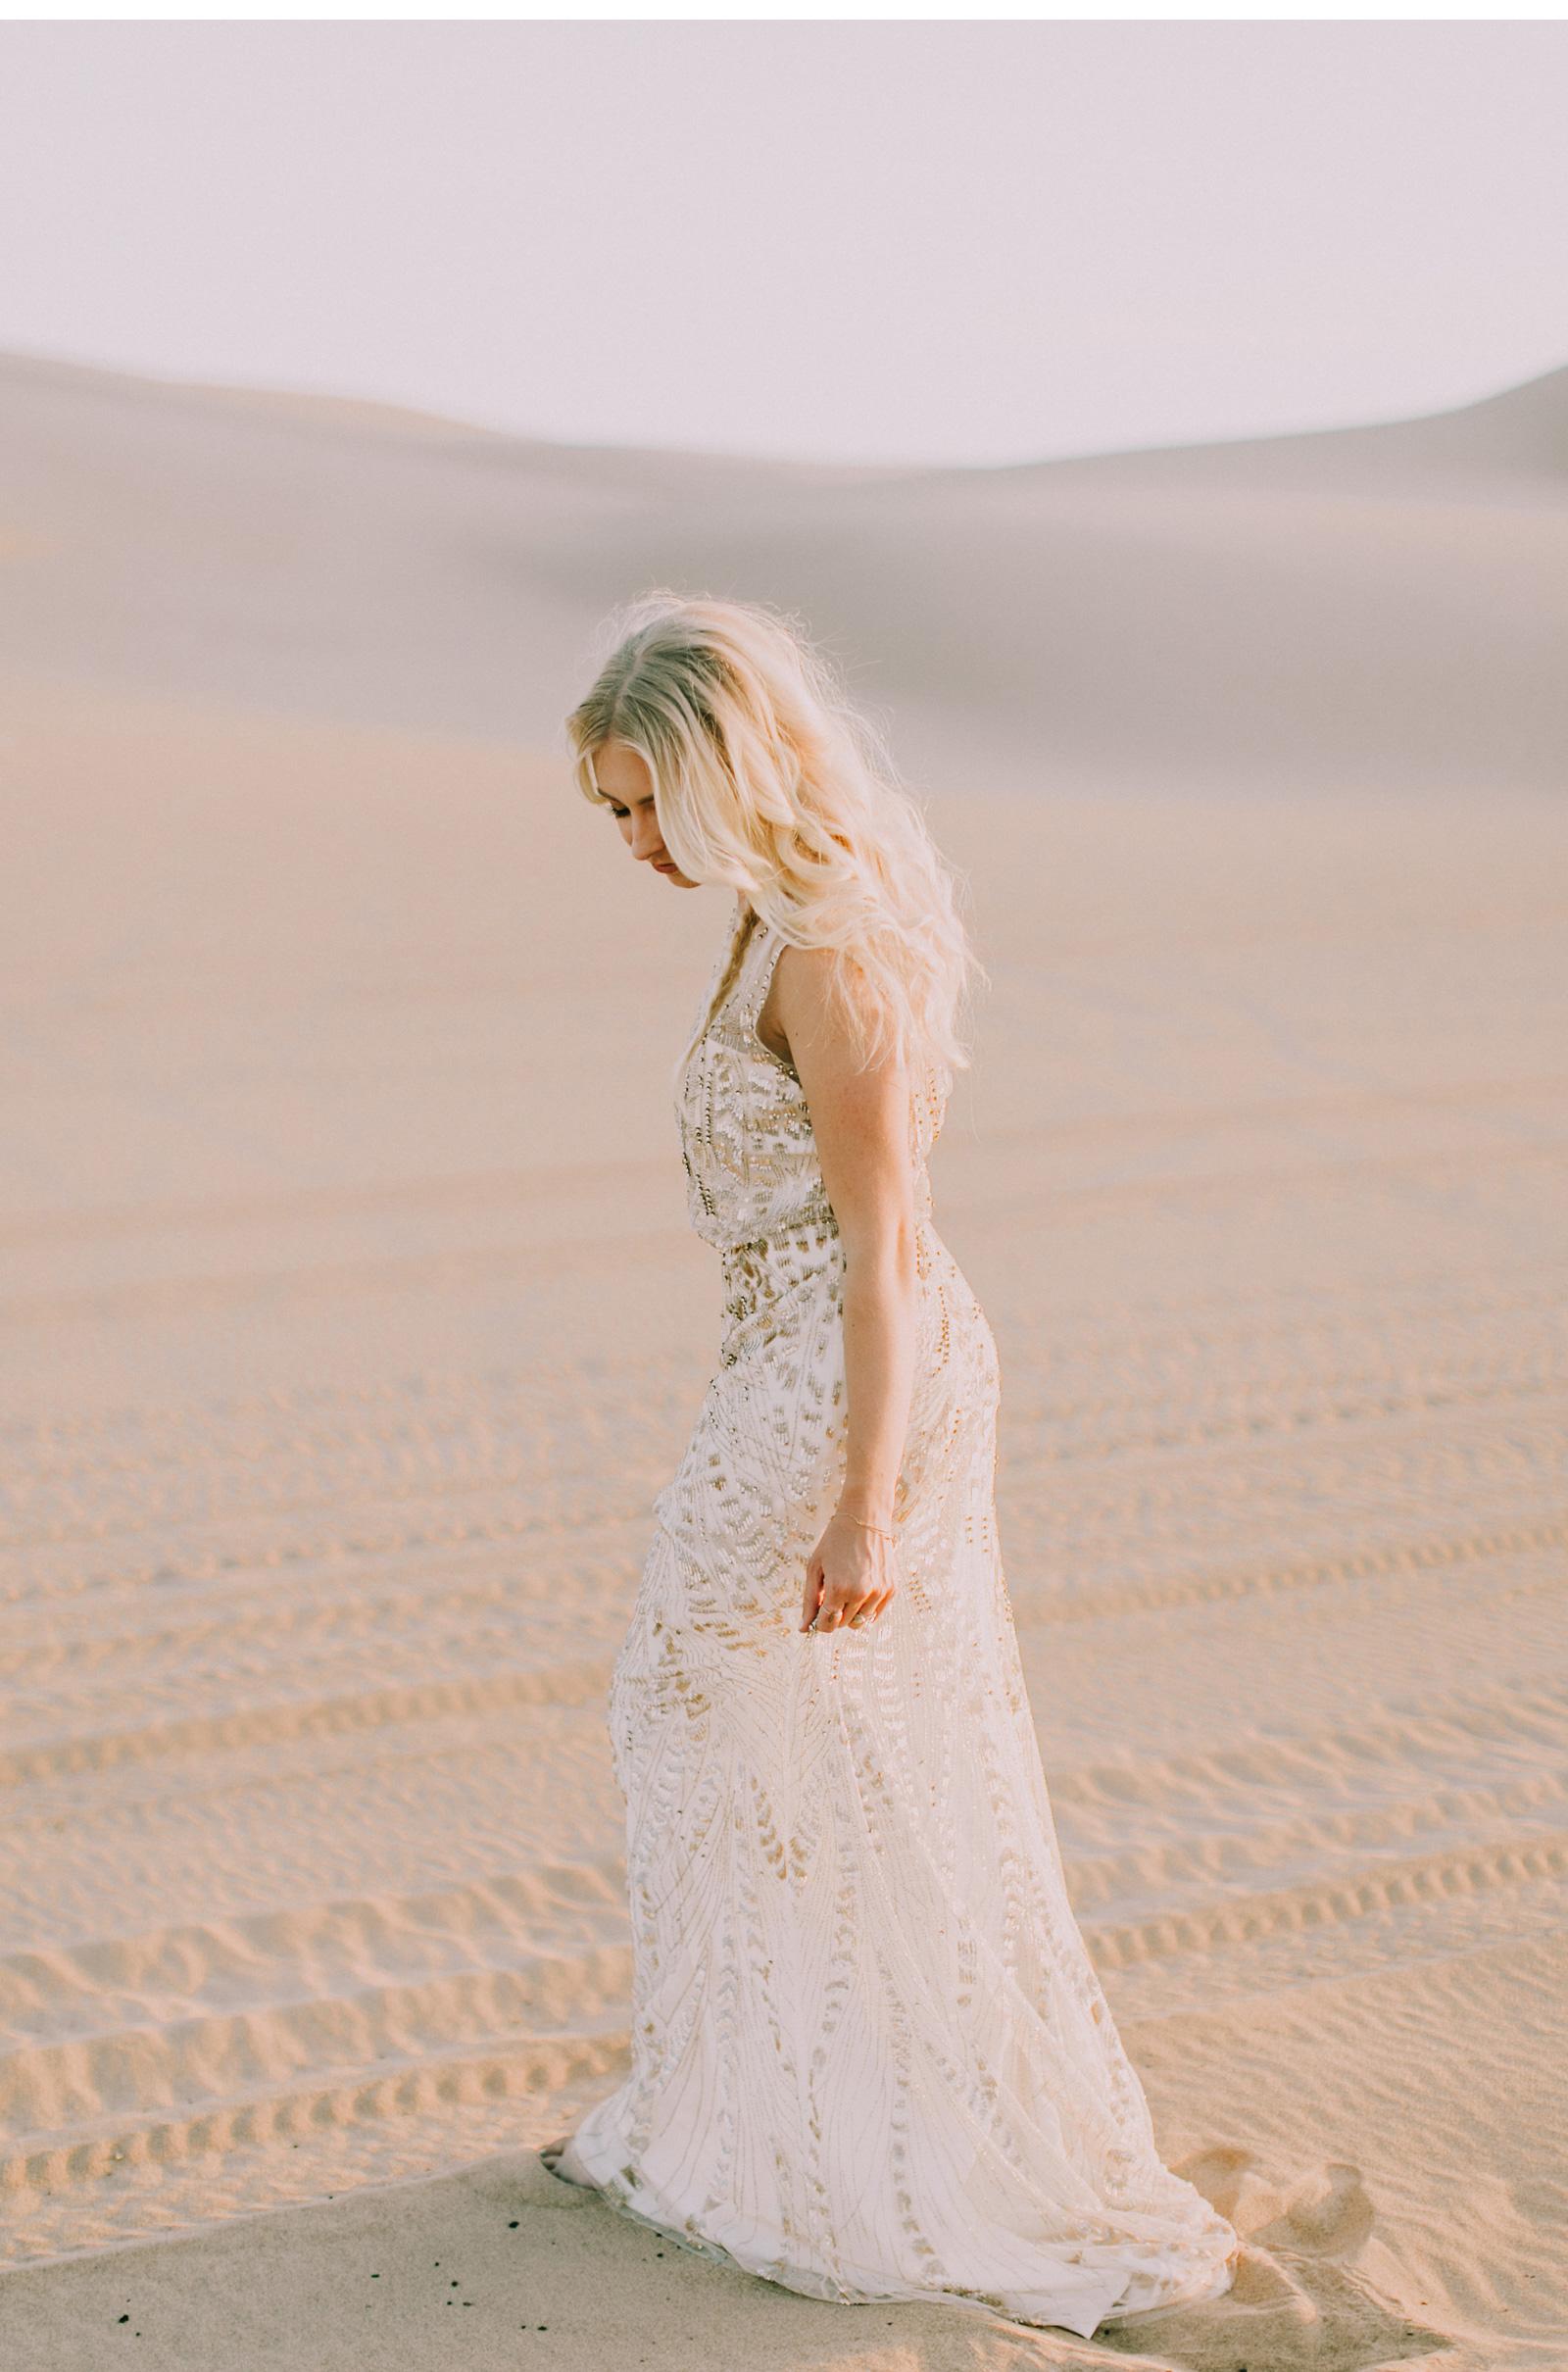 Desert-Wedding-Free-People-Wedding-Natalie-Schutt-Photography_01.jpg